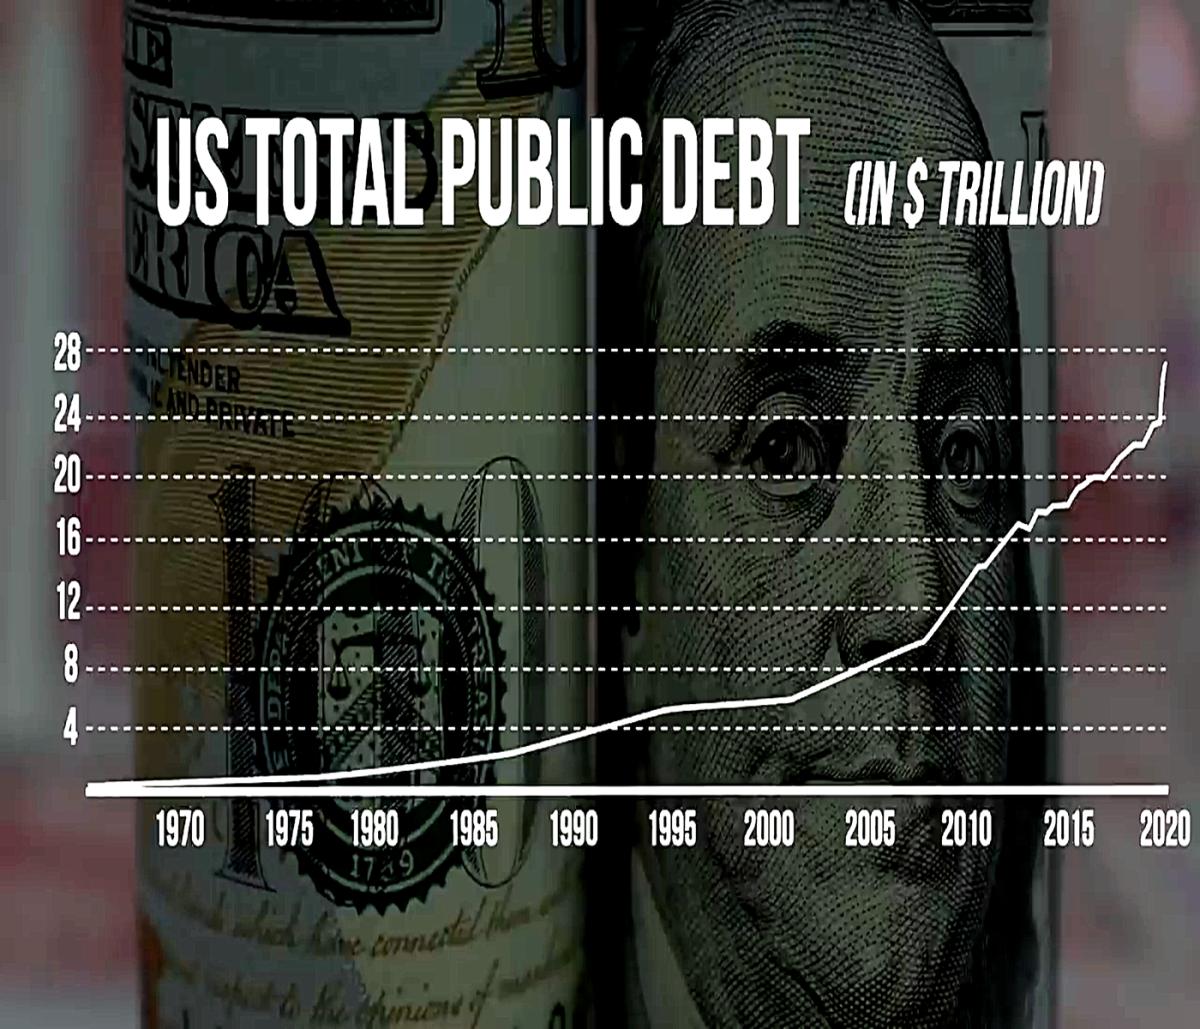 The escalating pattern of the U. S public debts.